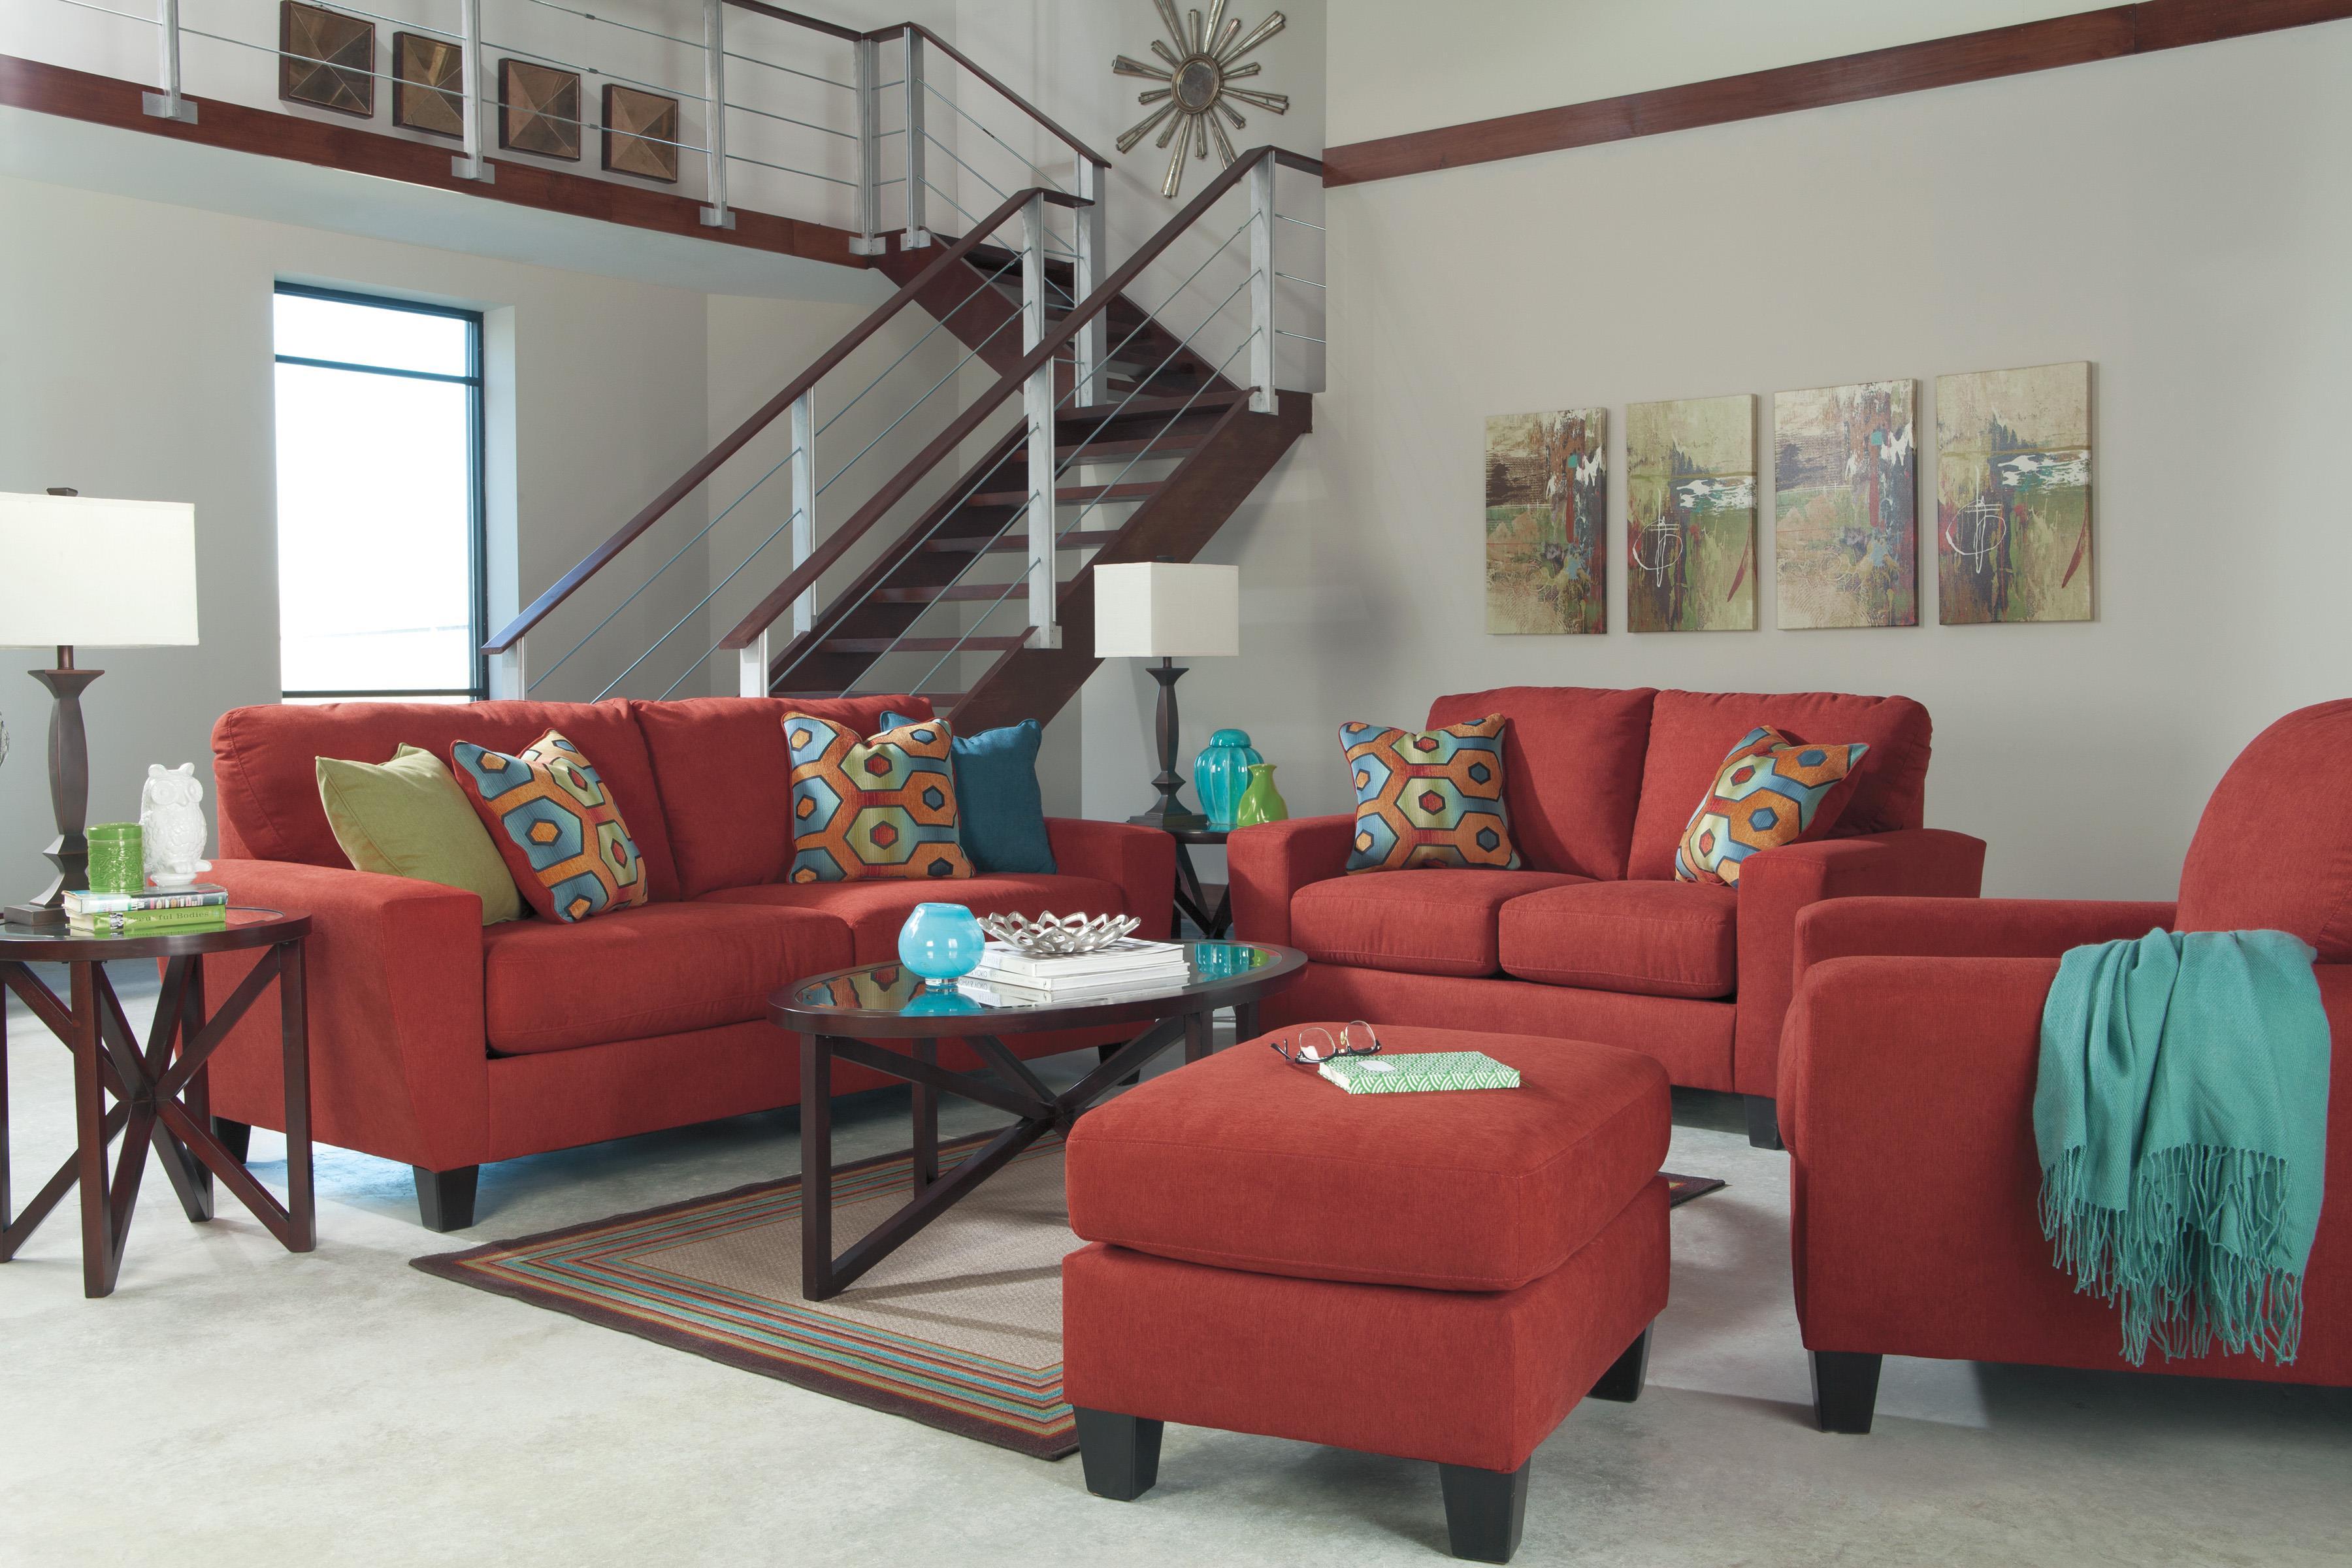 Signature Design by Ashley Sagen Stationary Living Room Group - Item Number: 93903 Living Room Group 3